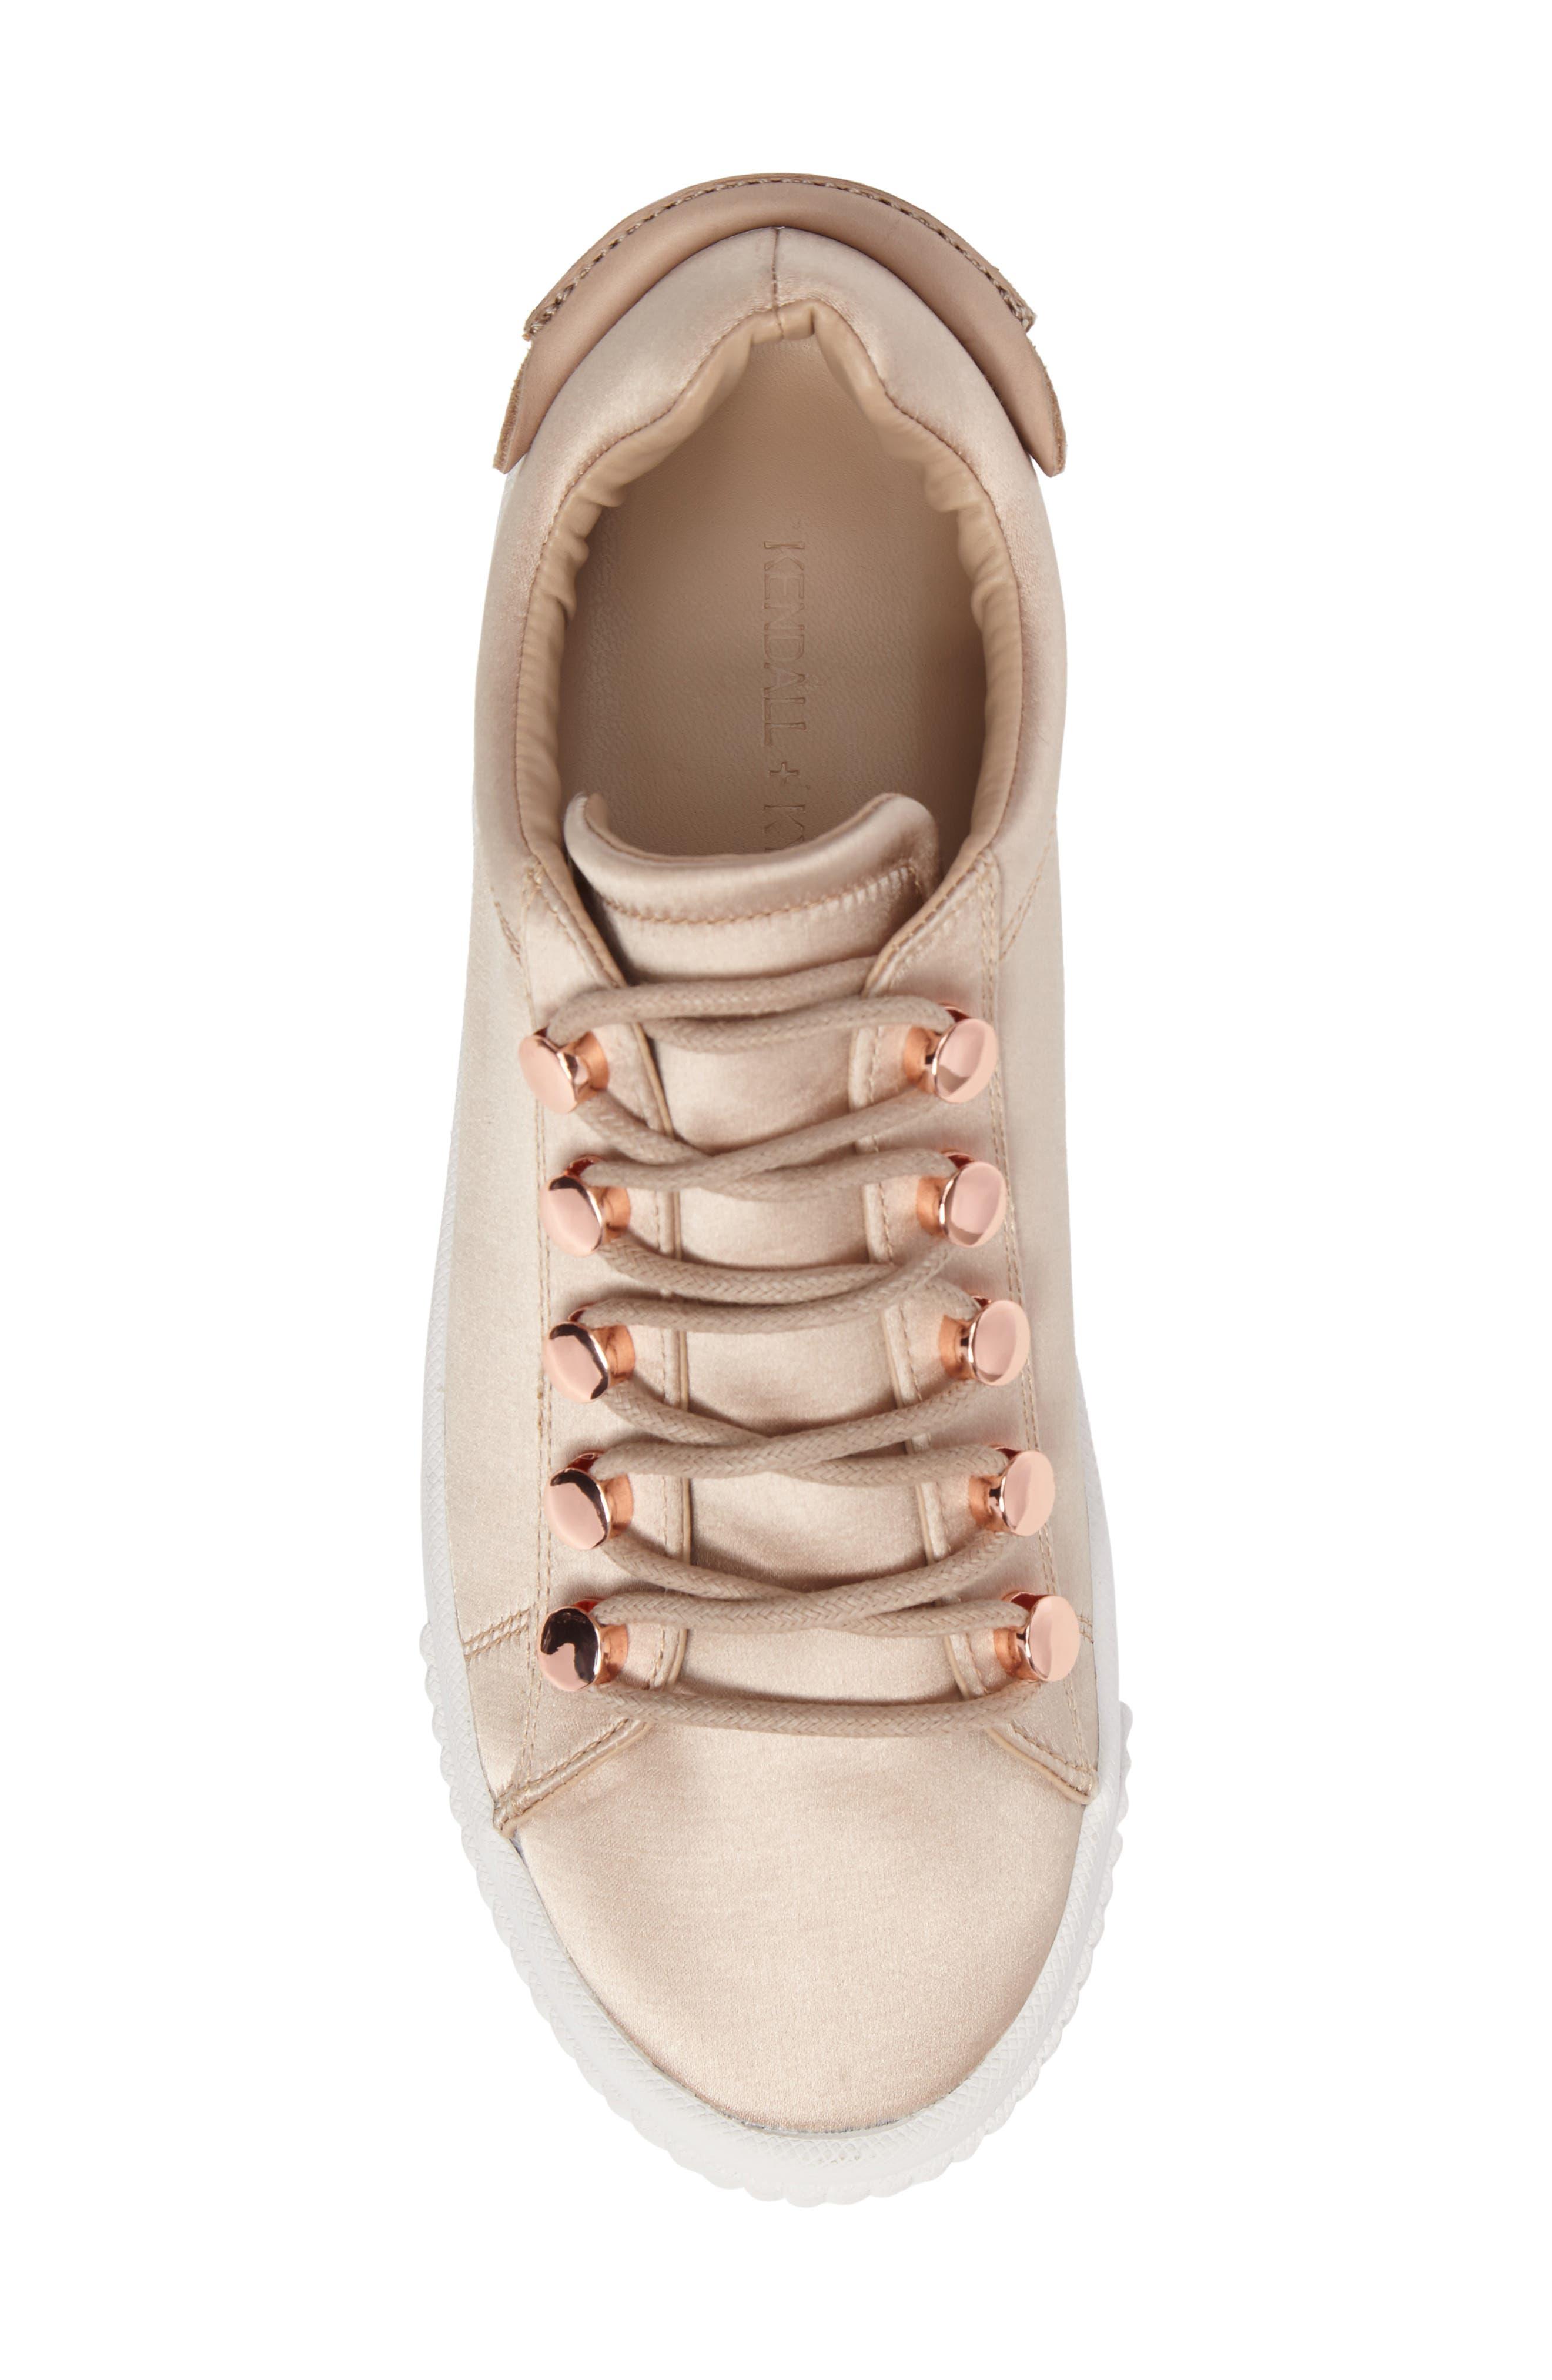 Rae 3 Platform Sneaker,                             Alternate thumbnail 5, color,                             Blush Satin